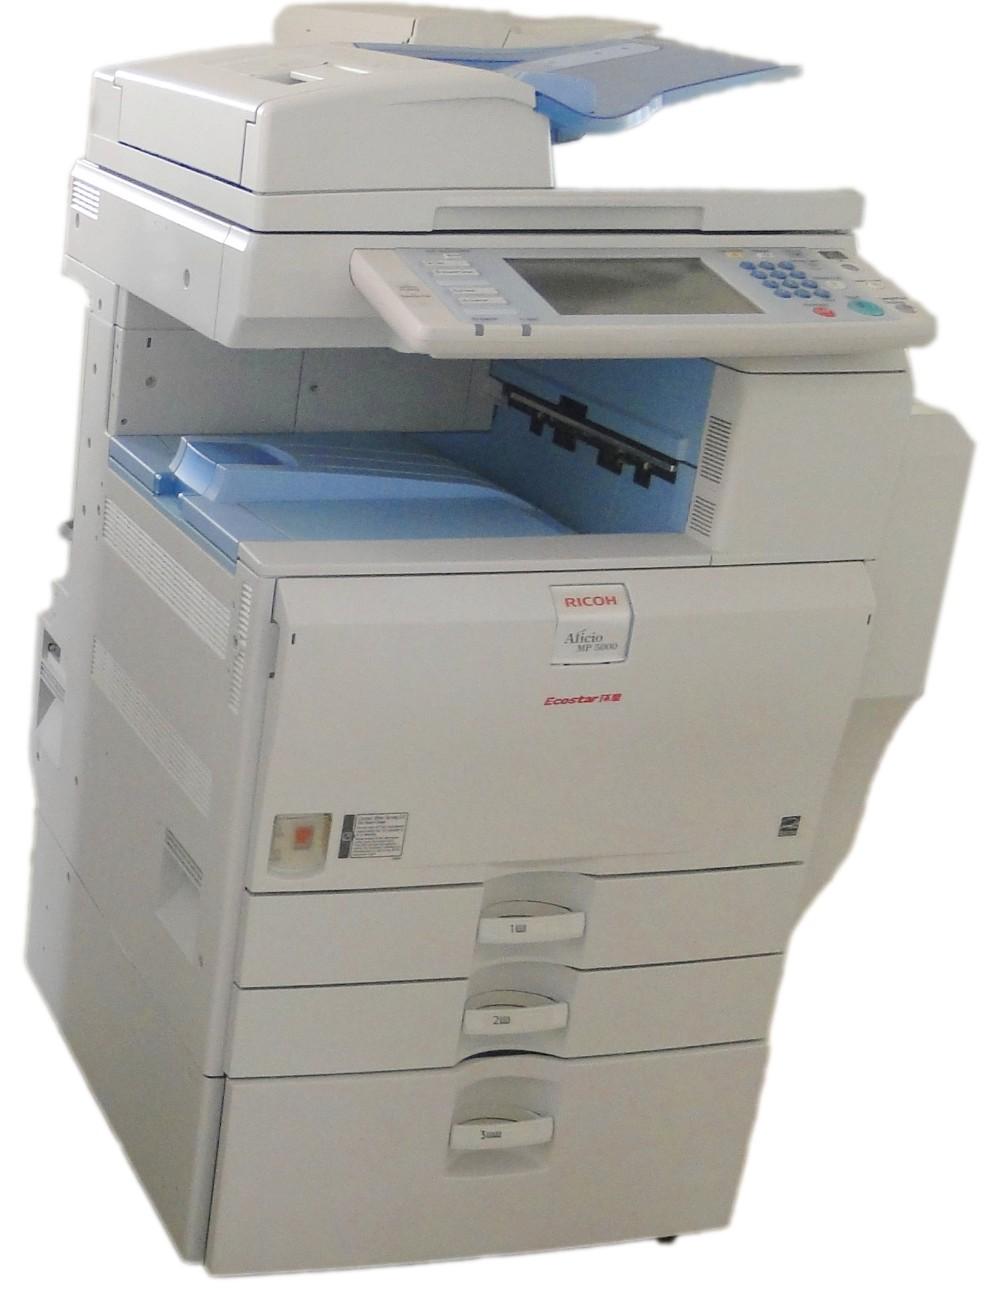 used ricoh aficio photo copier machine MP5001 A3 black photocopy printer machine